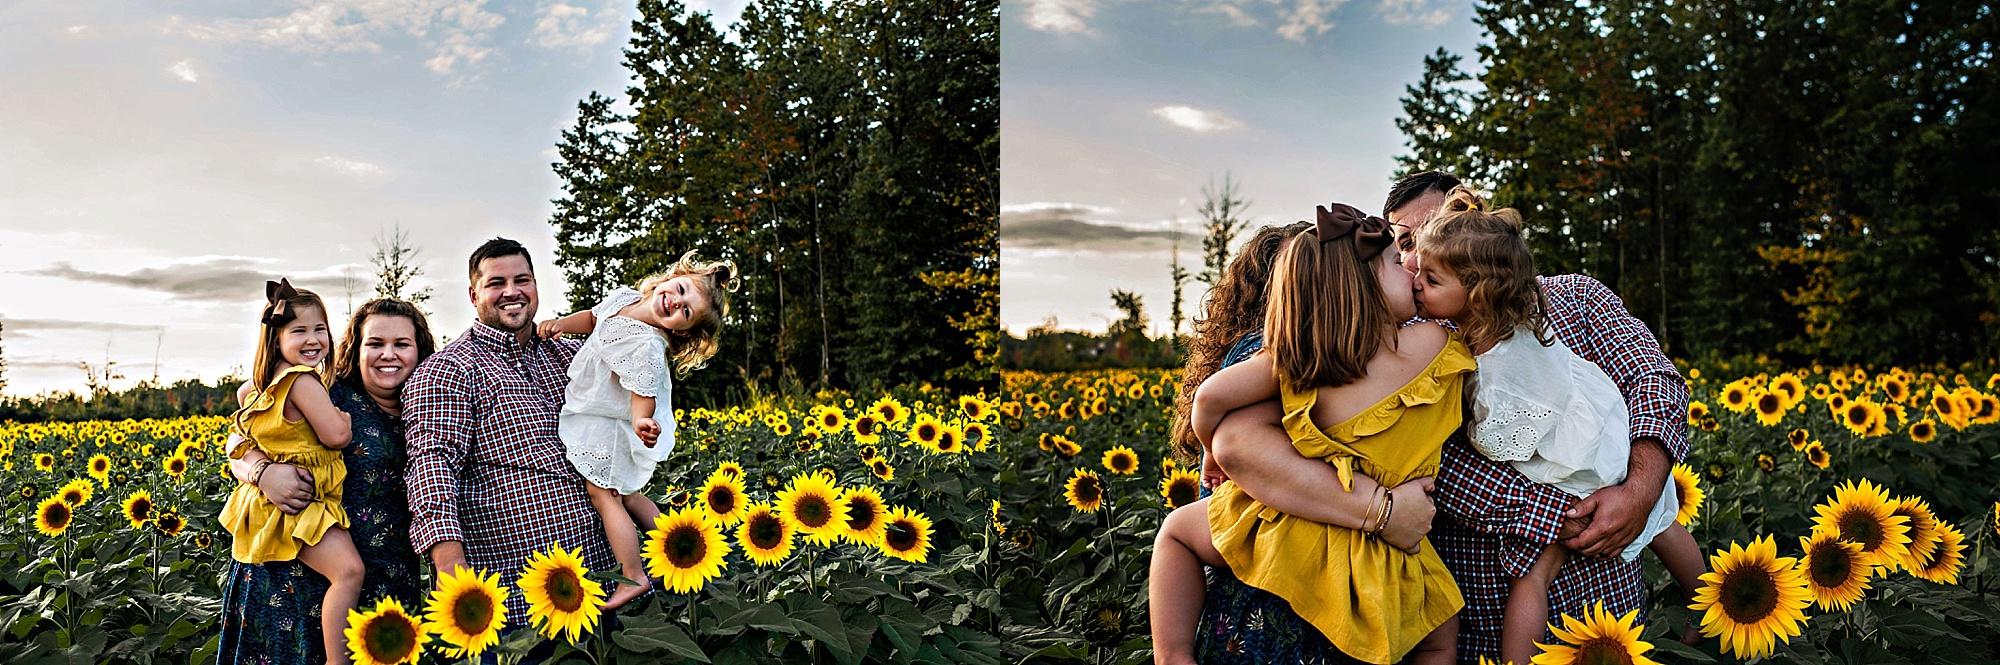 Rutherford-family-cleveland-photographer-lauren-grayson-sunflower-field-session_0024.jpg